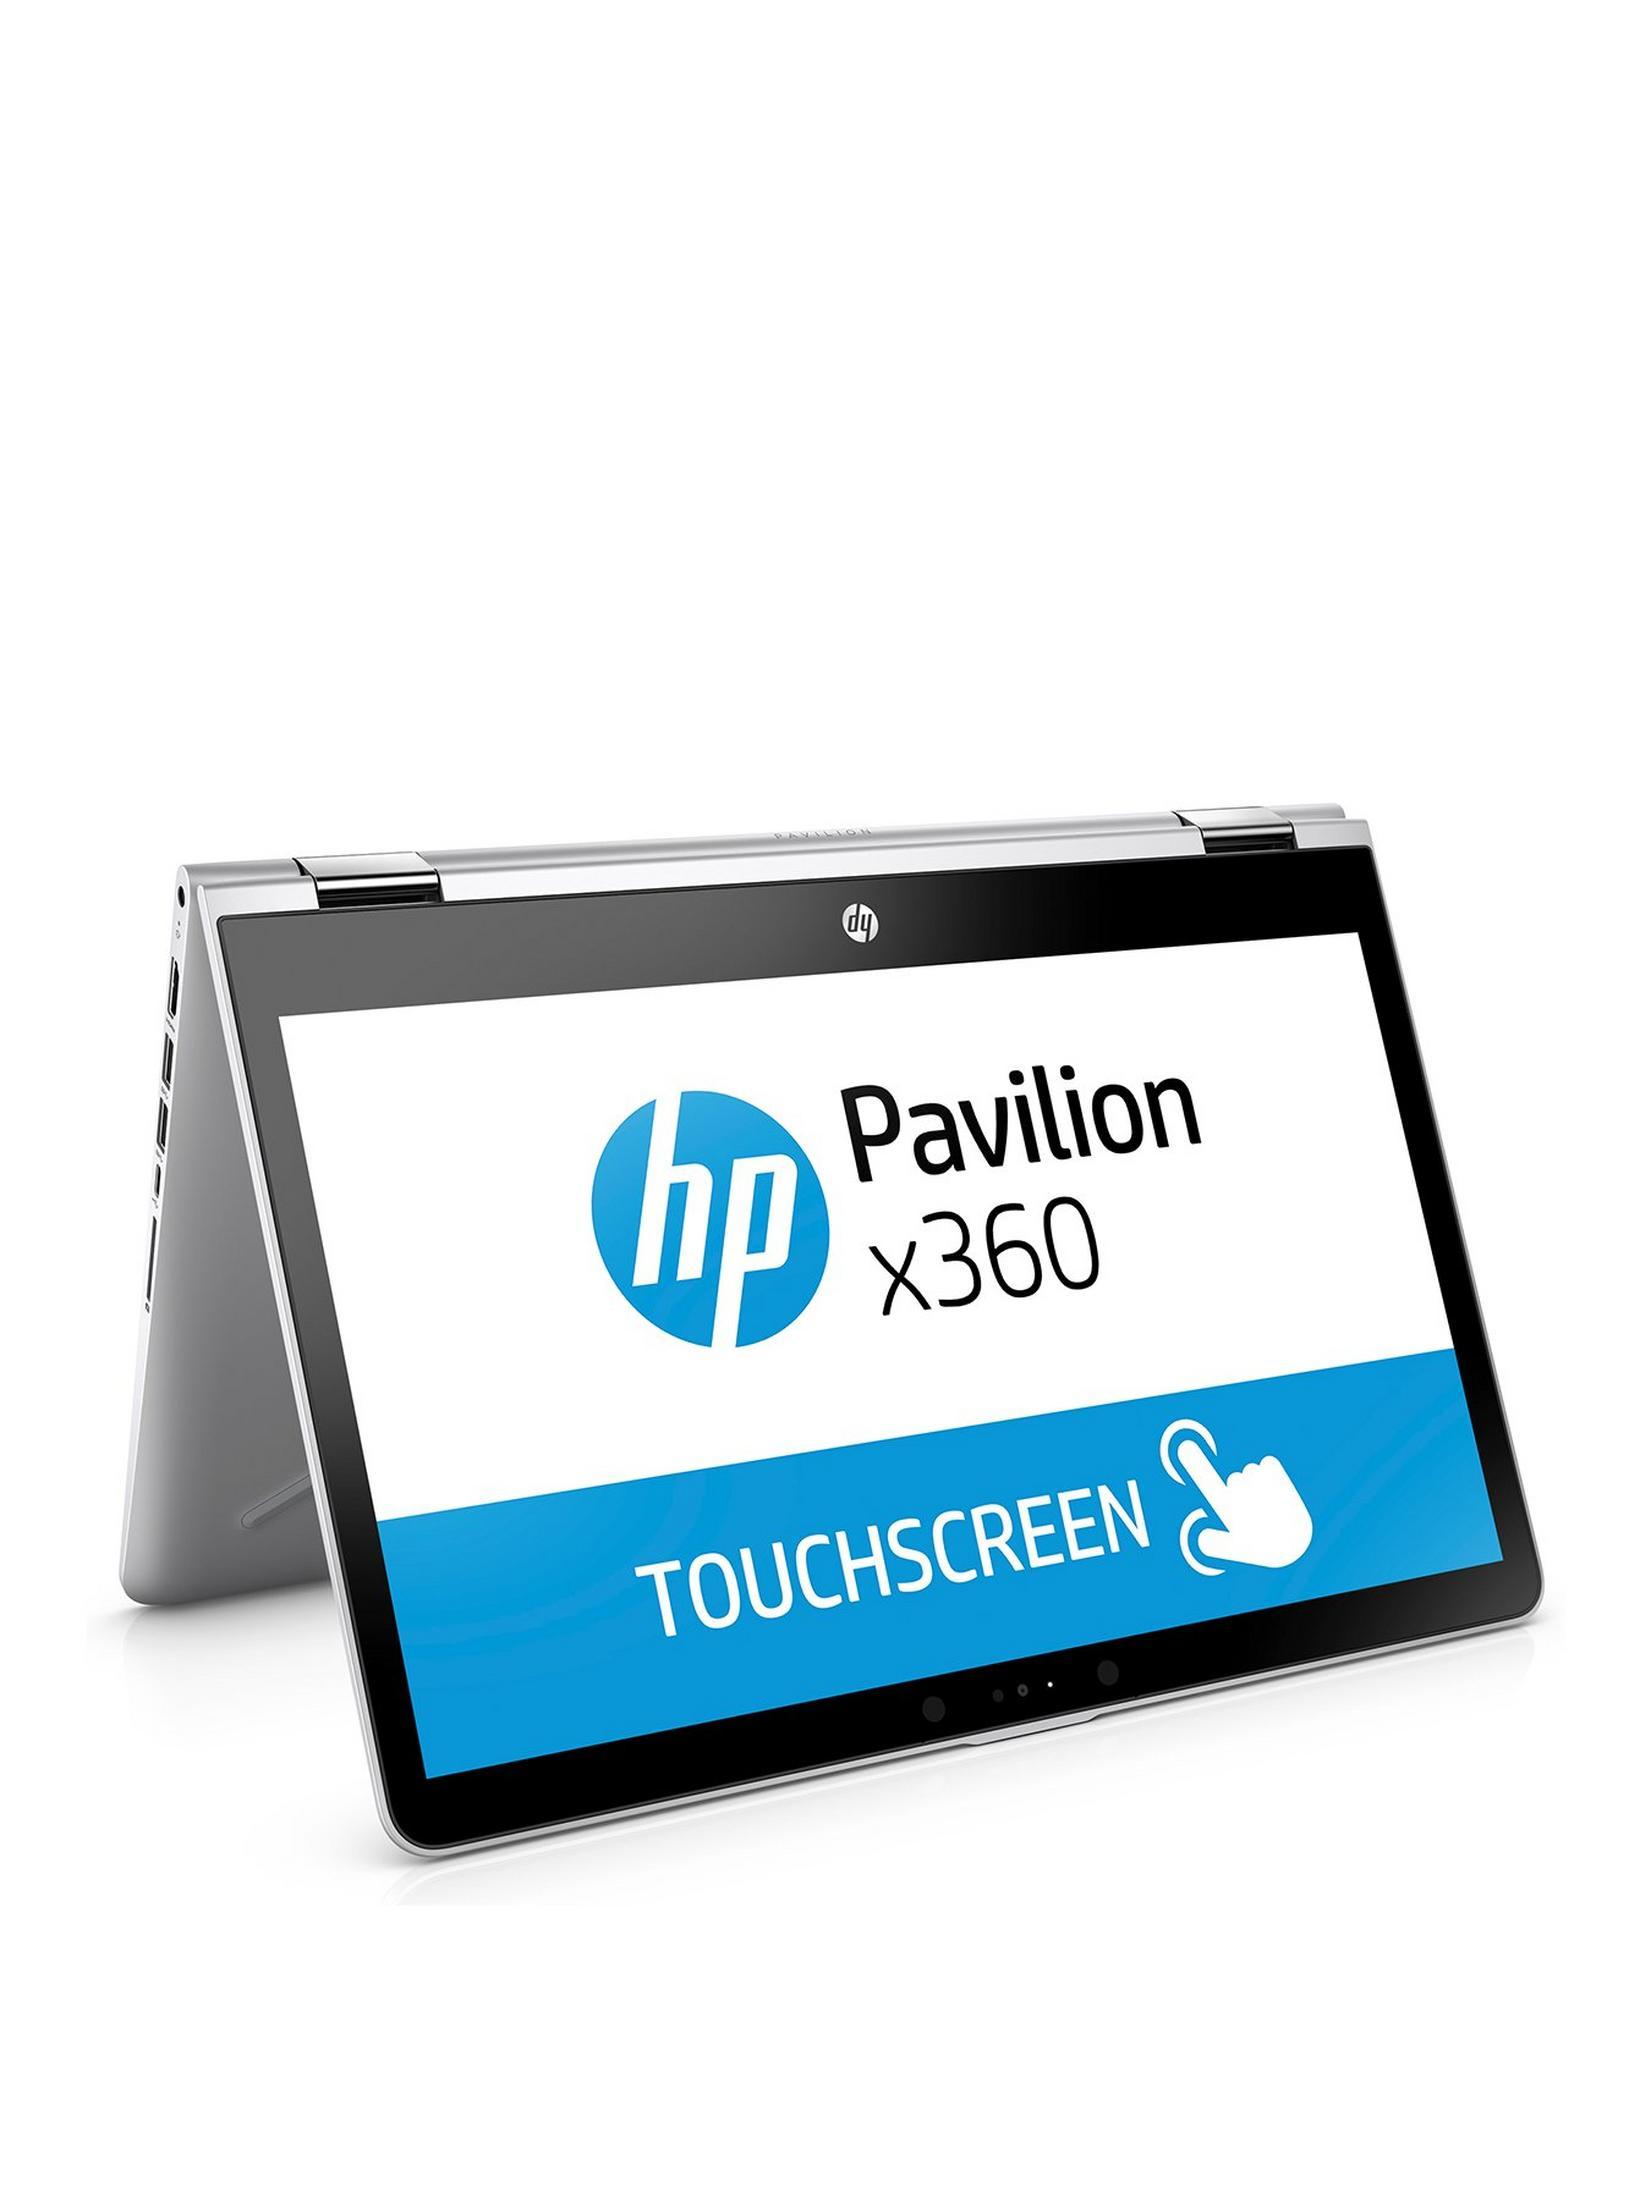 HP Pavilion x360 14-ba104na, Touch screen, Intel® Core™ i5-8250U, 8Gb RAM, 256Gb SSD, 14 inch, FHD IPS Laptop (possibly £531) £589.99 @ Very